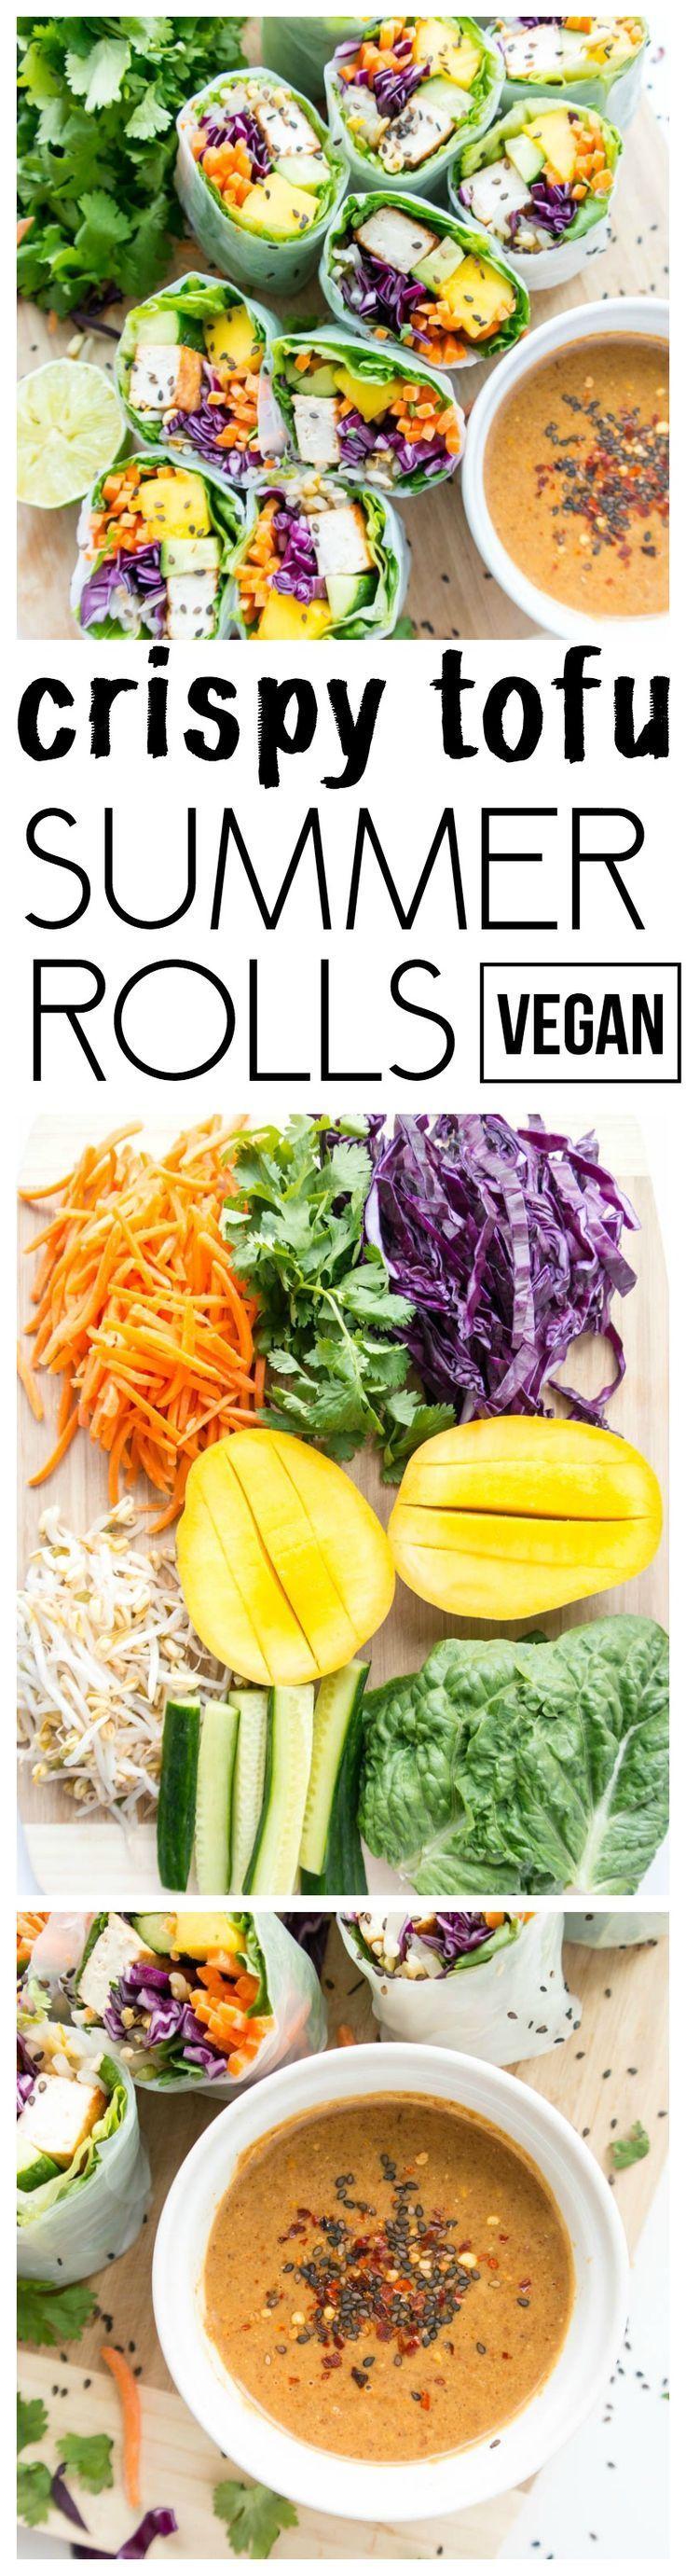 'Tofu Veggie Summer Rolls' with Spicy Almond Butter Sauce. Vegan, Gluten Free, Plant Based. Fresh, light & super healthy with crispy tofu, crunchy veggies, juicy mango & tangy, spicy almond butter dipping sauce! #vegan #summer #rolls